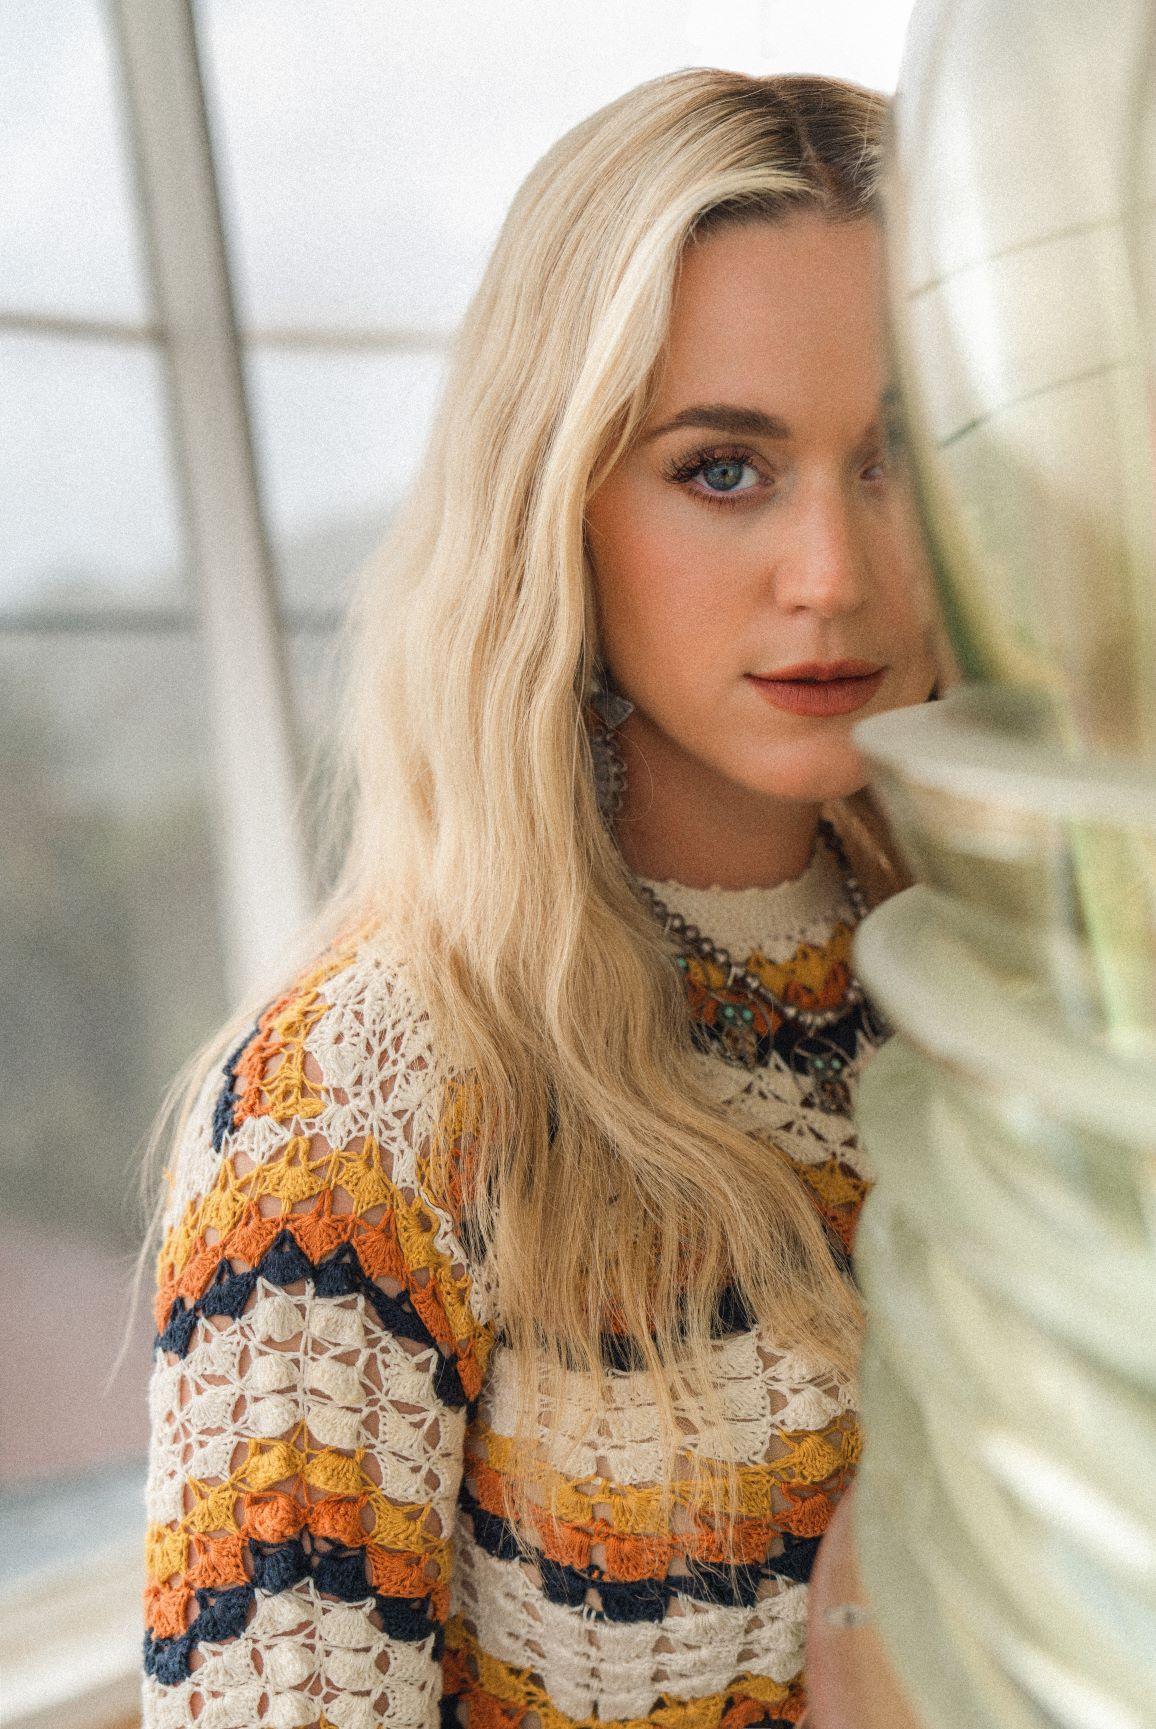 Katy Perry album e tour - Immagini